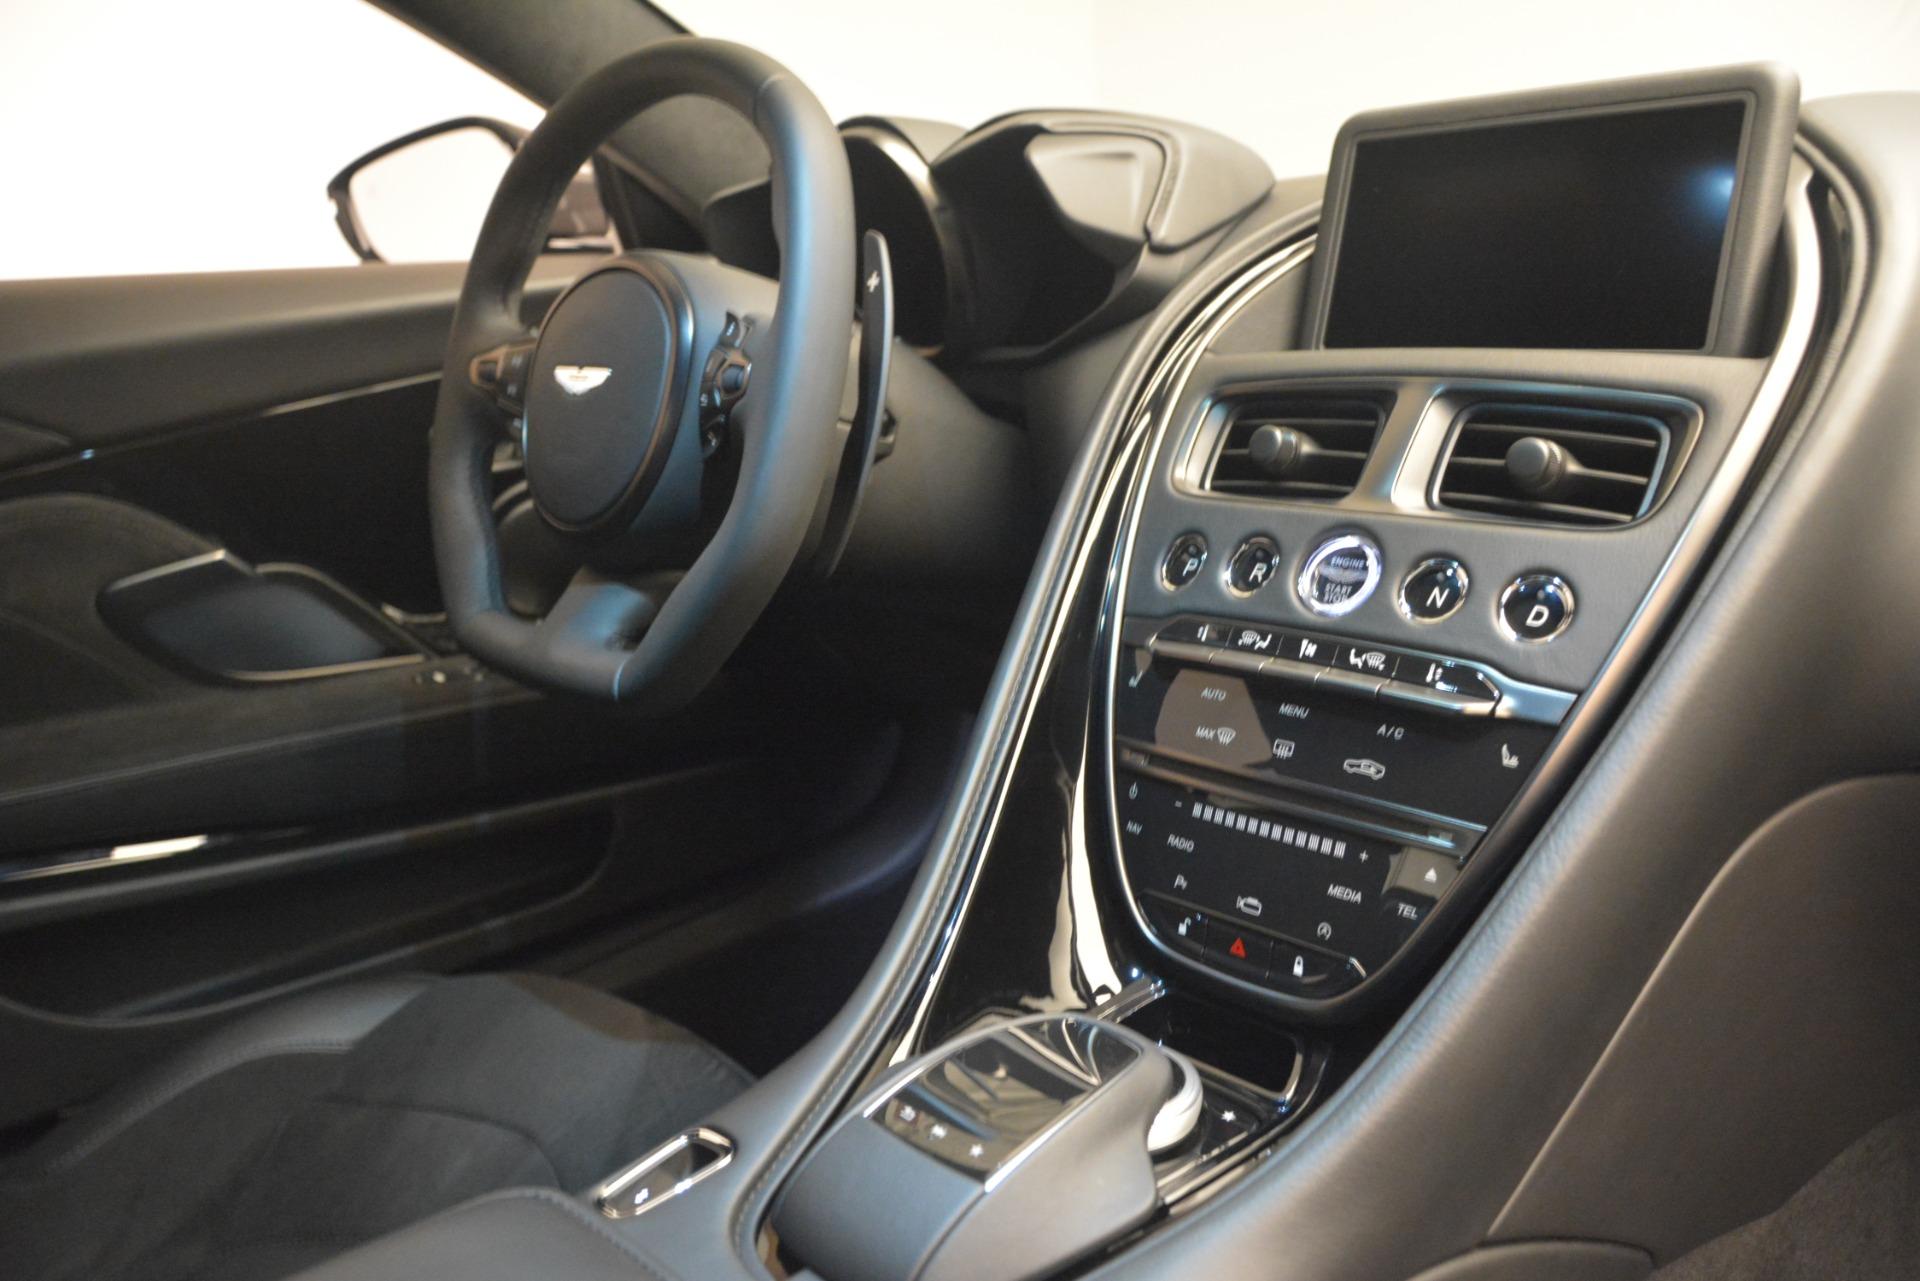 Used 2019 Aston Martin DBS Superleggera Coupe For Sale In Greenwich, CT 2917_p21